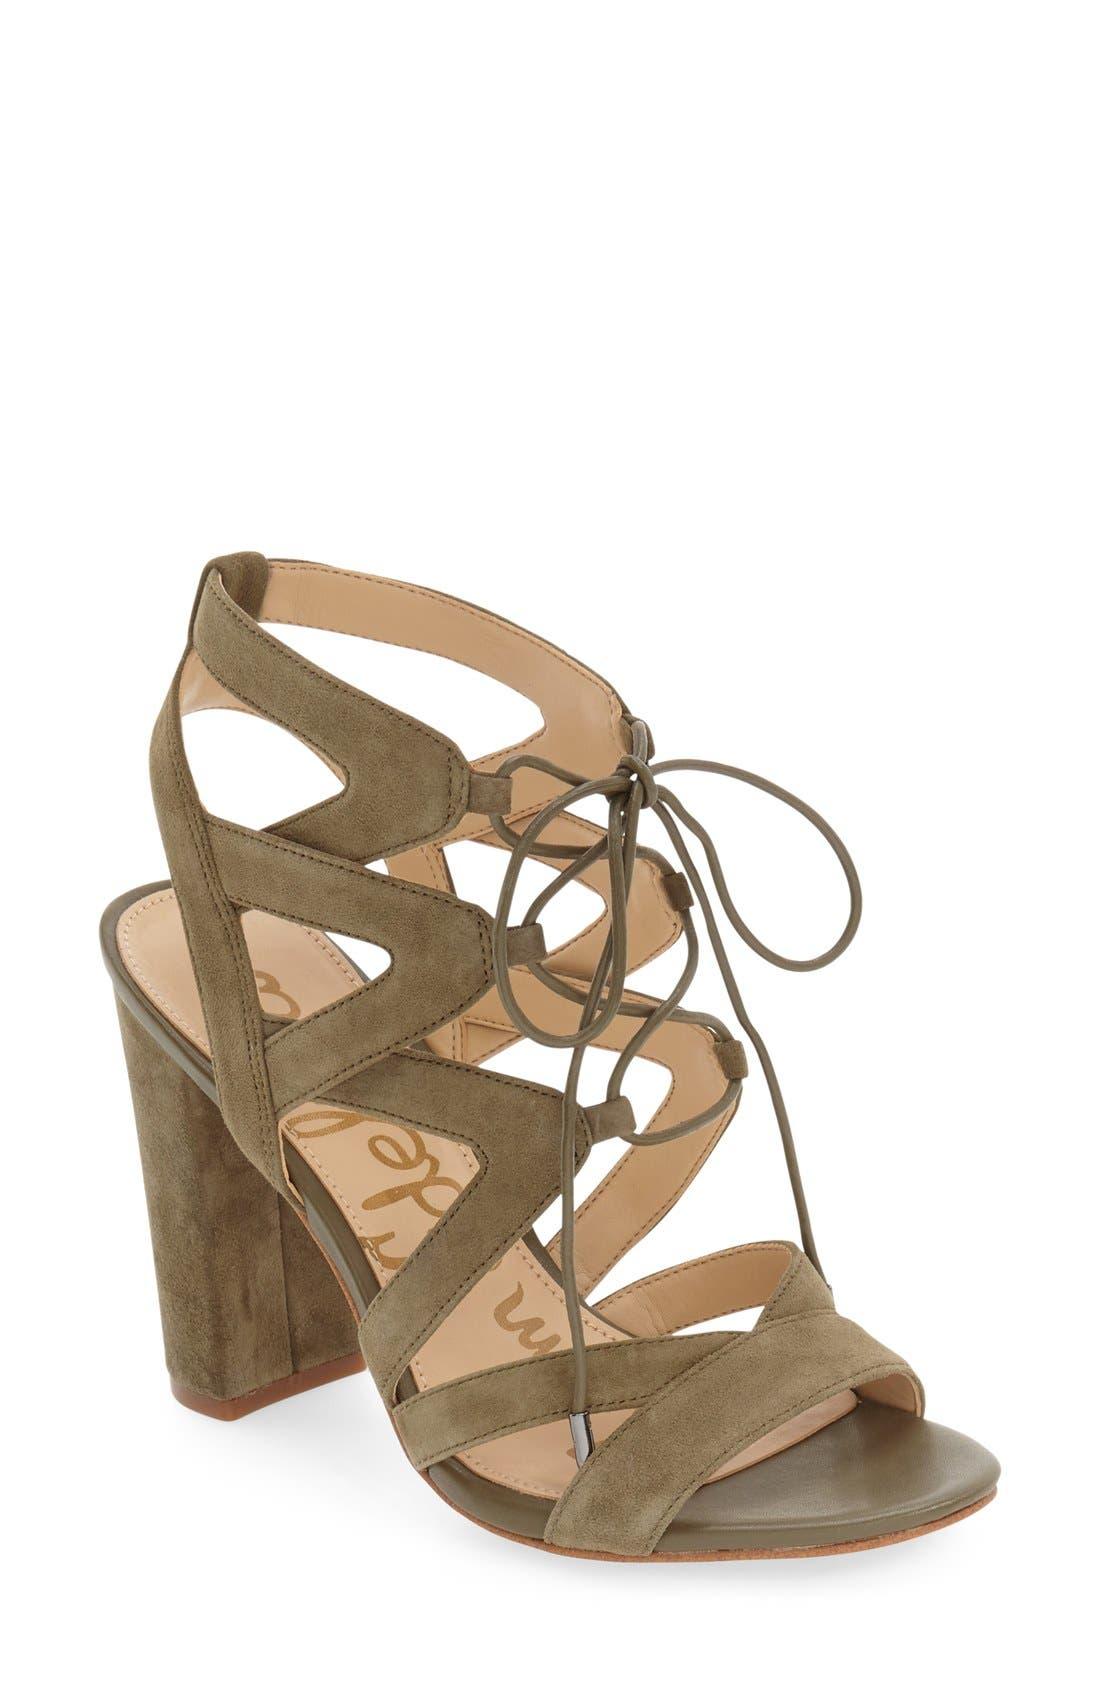 Main Image - Sam Edelman 'Yardley' Lace-Up Sandal (Women)